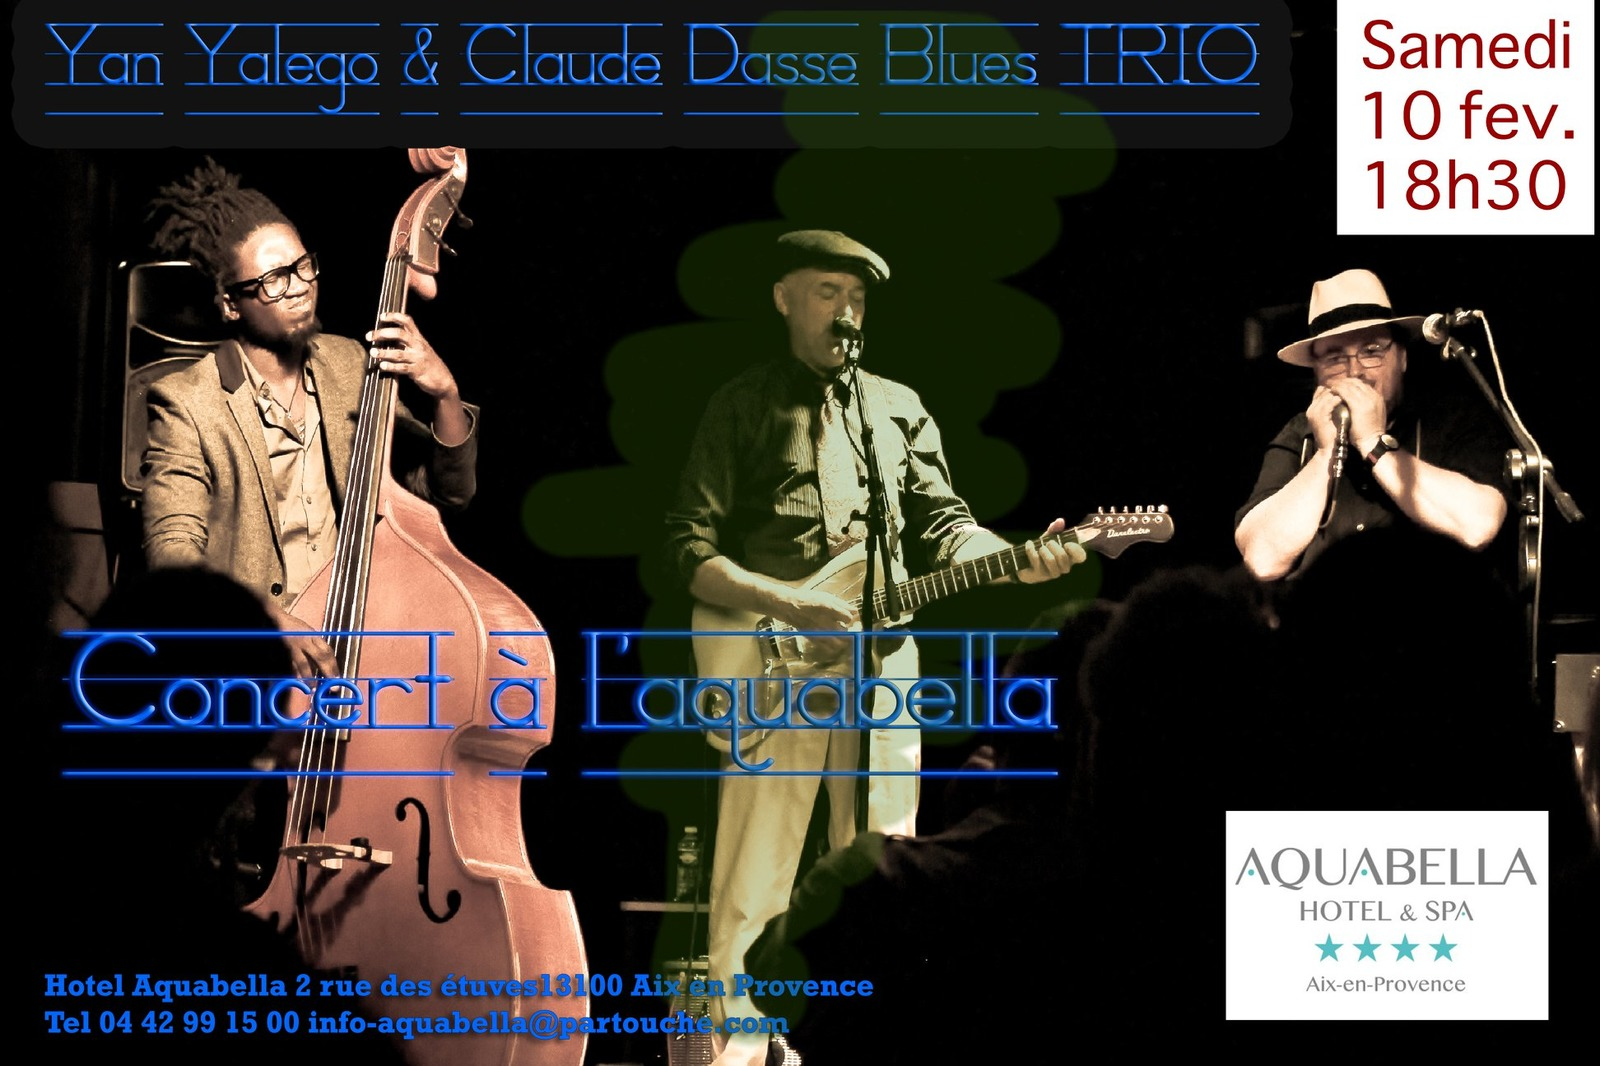 Evfevent Yan Yalego Claude Dasse Blues Trio 866165